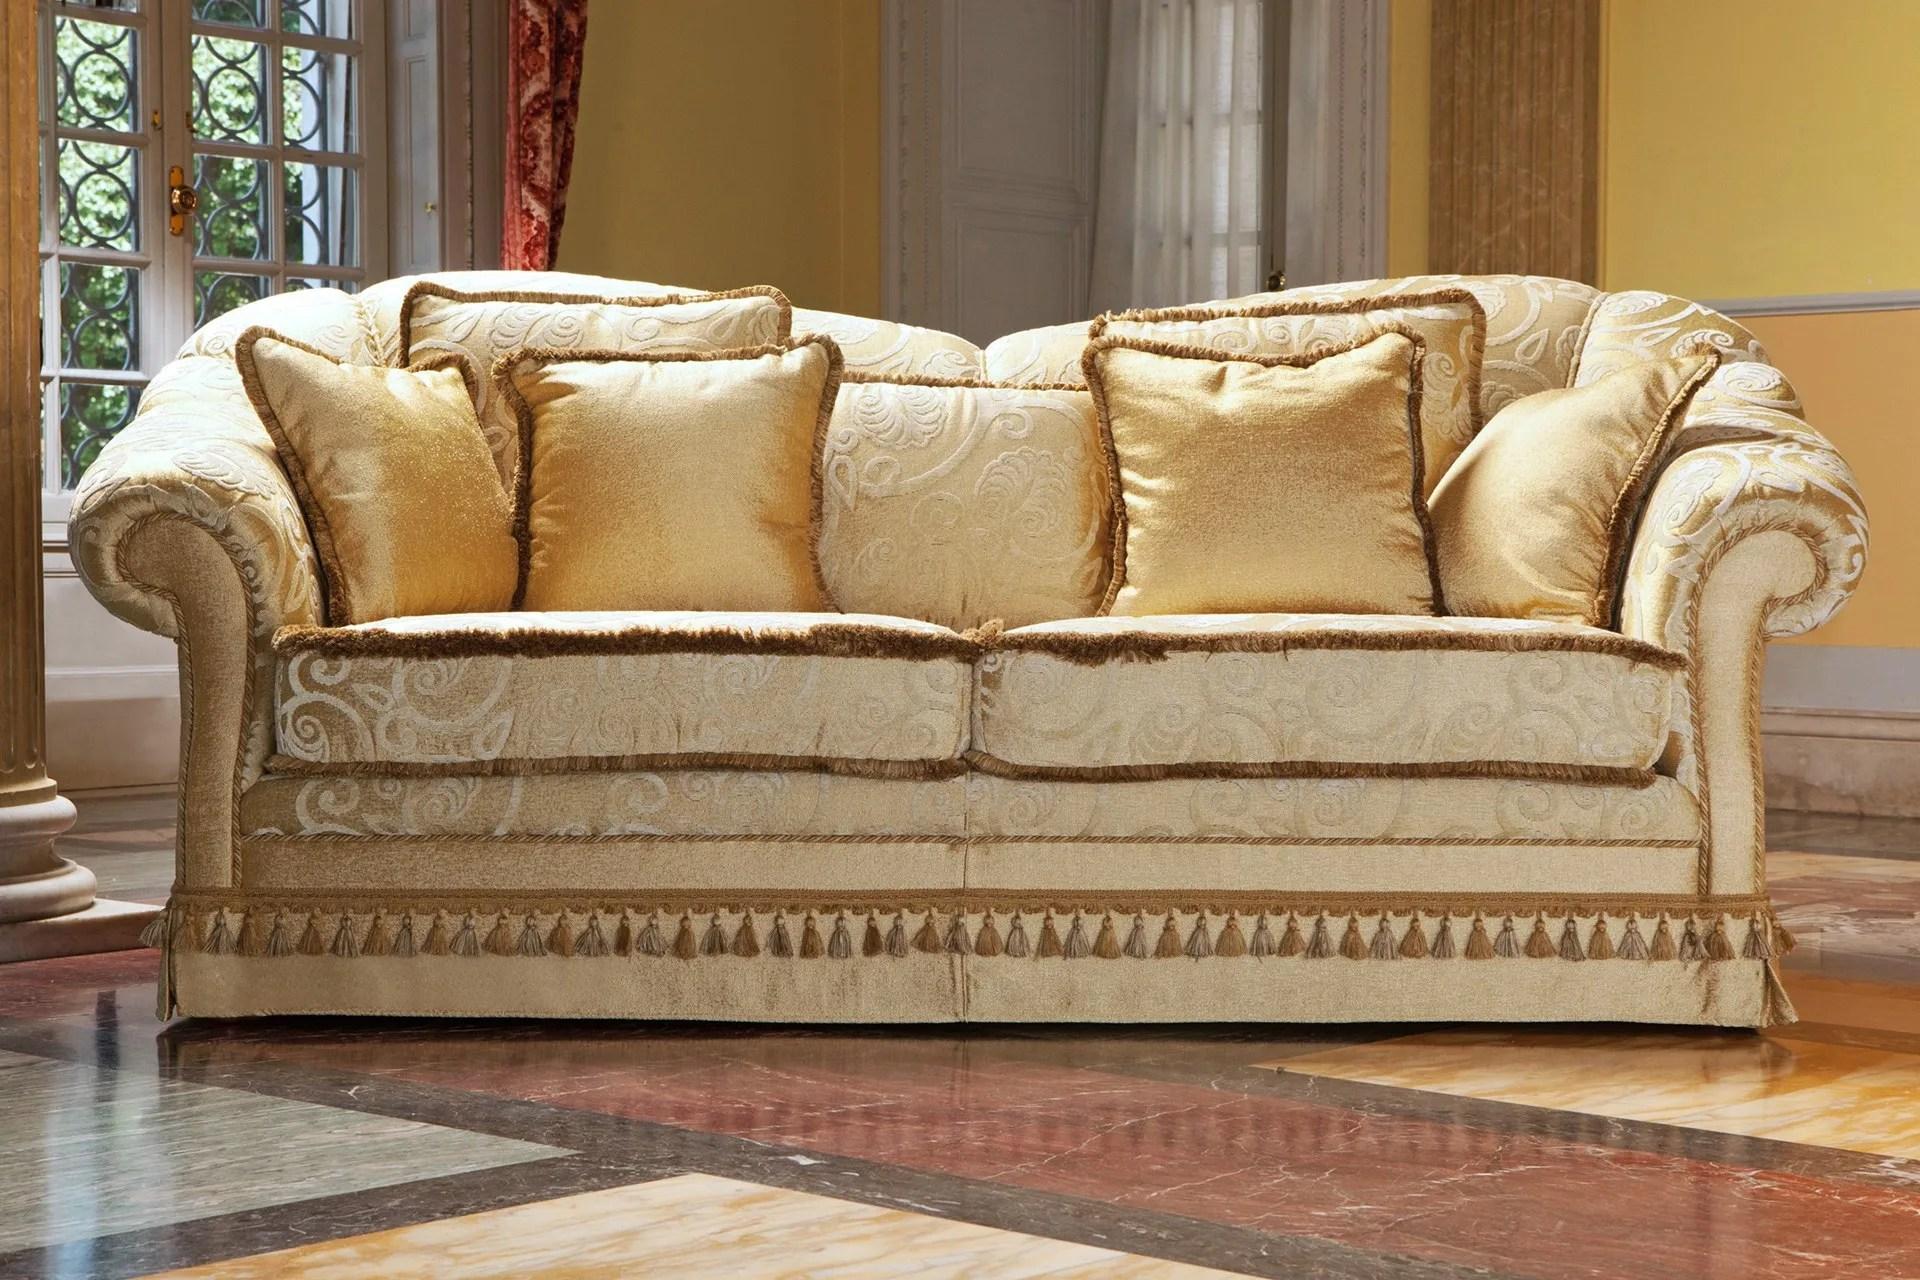 classic style sofa how do i make my sleeper more comfortable zeryba divano in stile classico collezione by